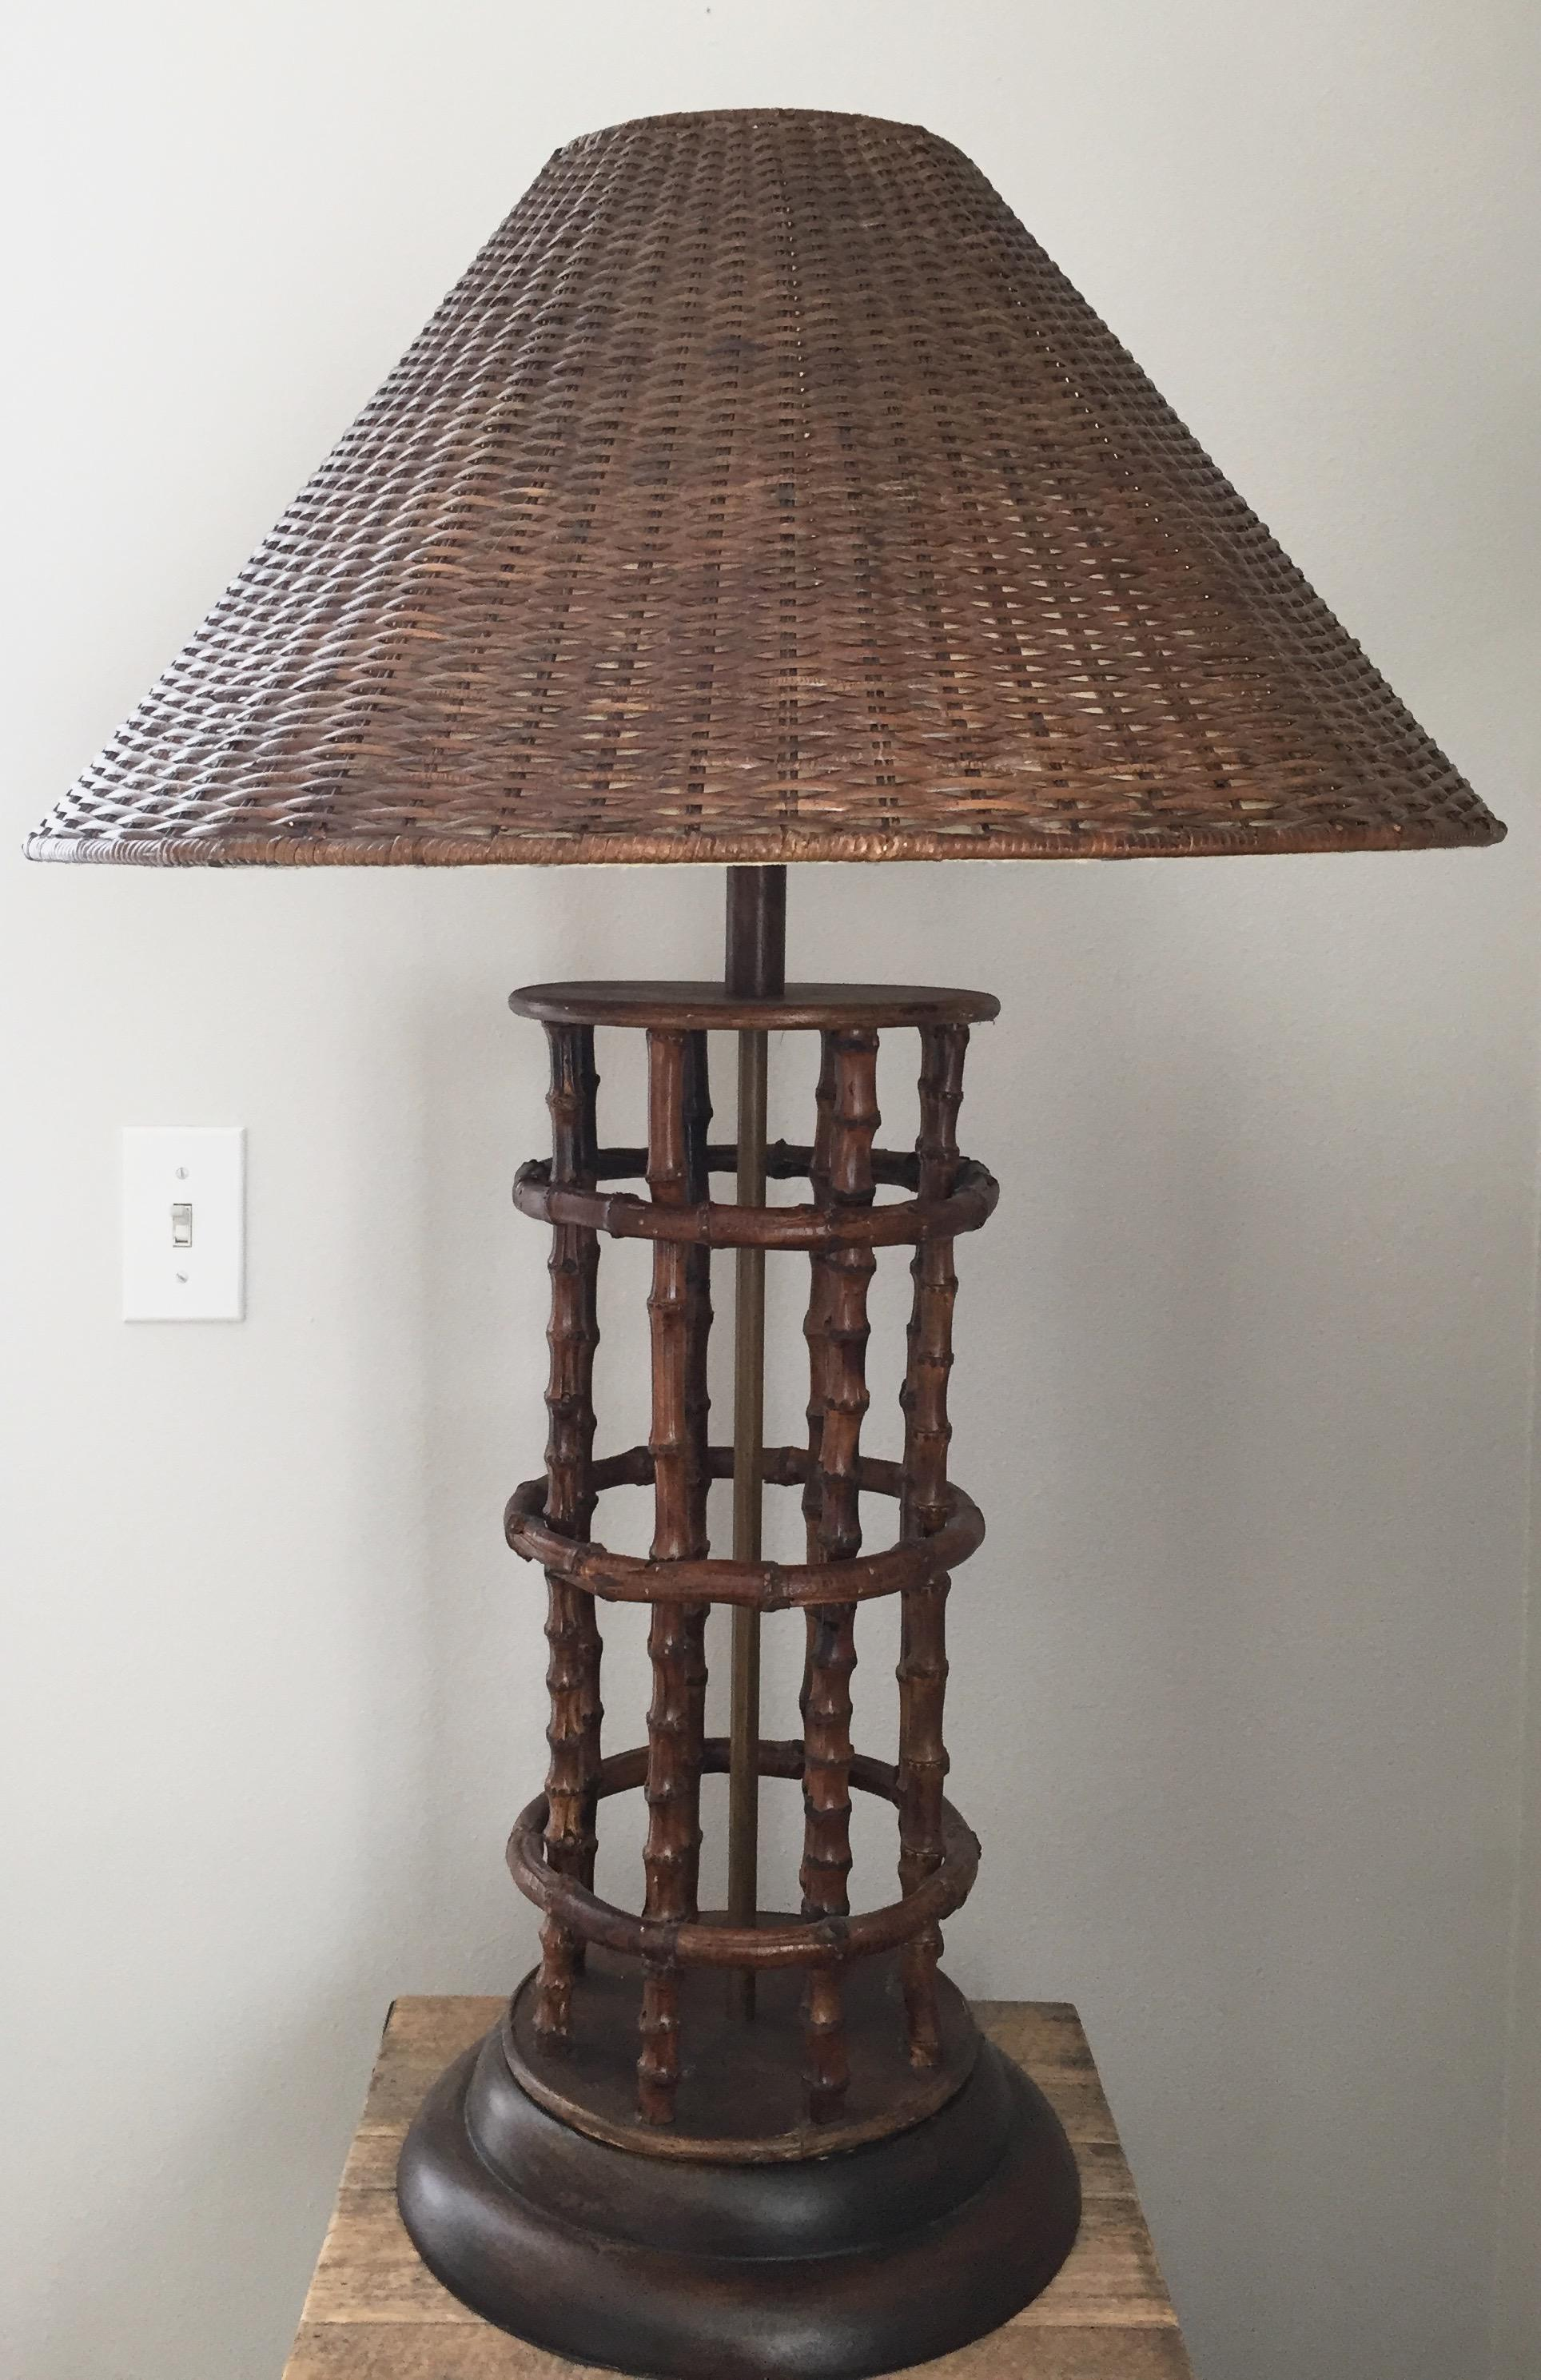 Vintage Rattan U0026 Bamboo Table Lamp   Image 2 ...